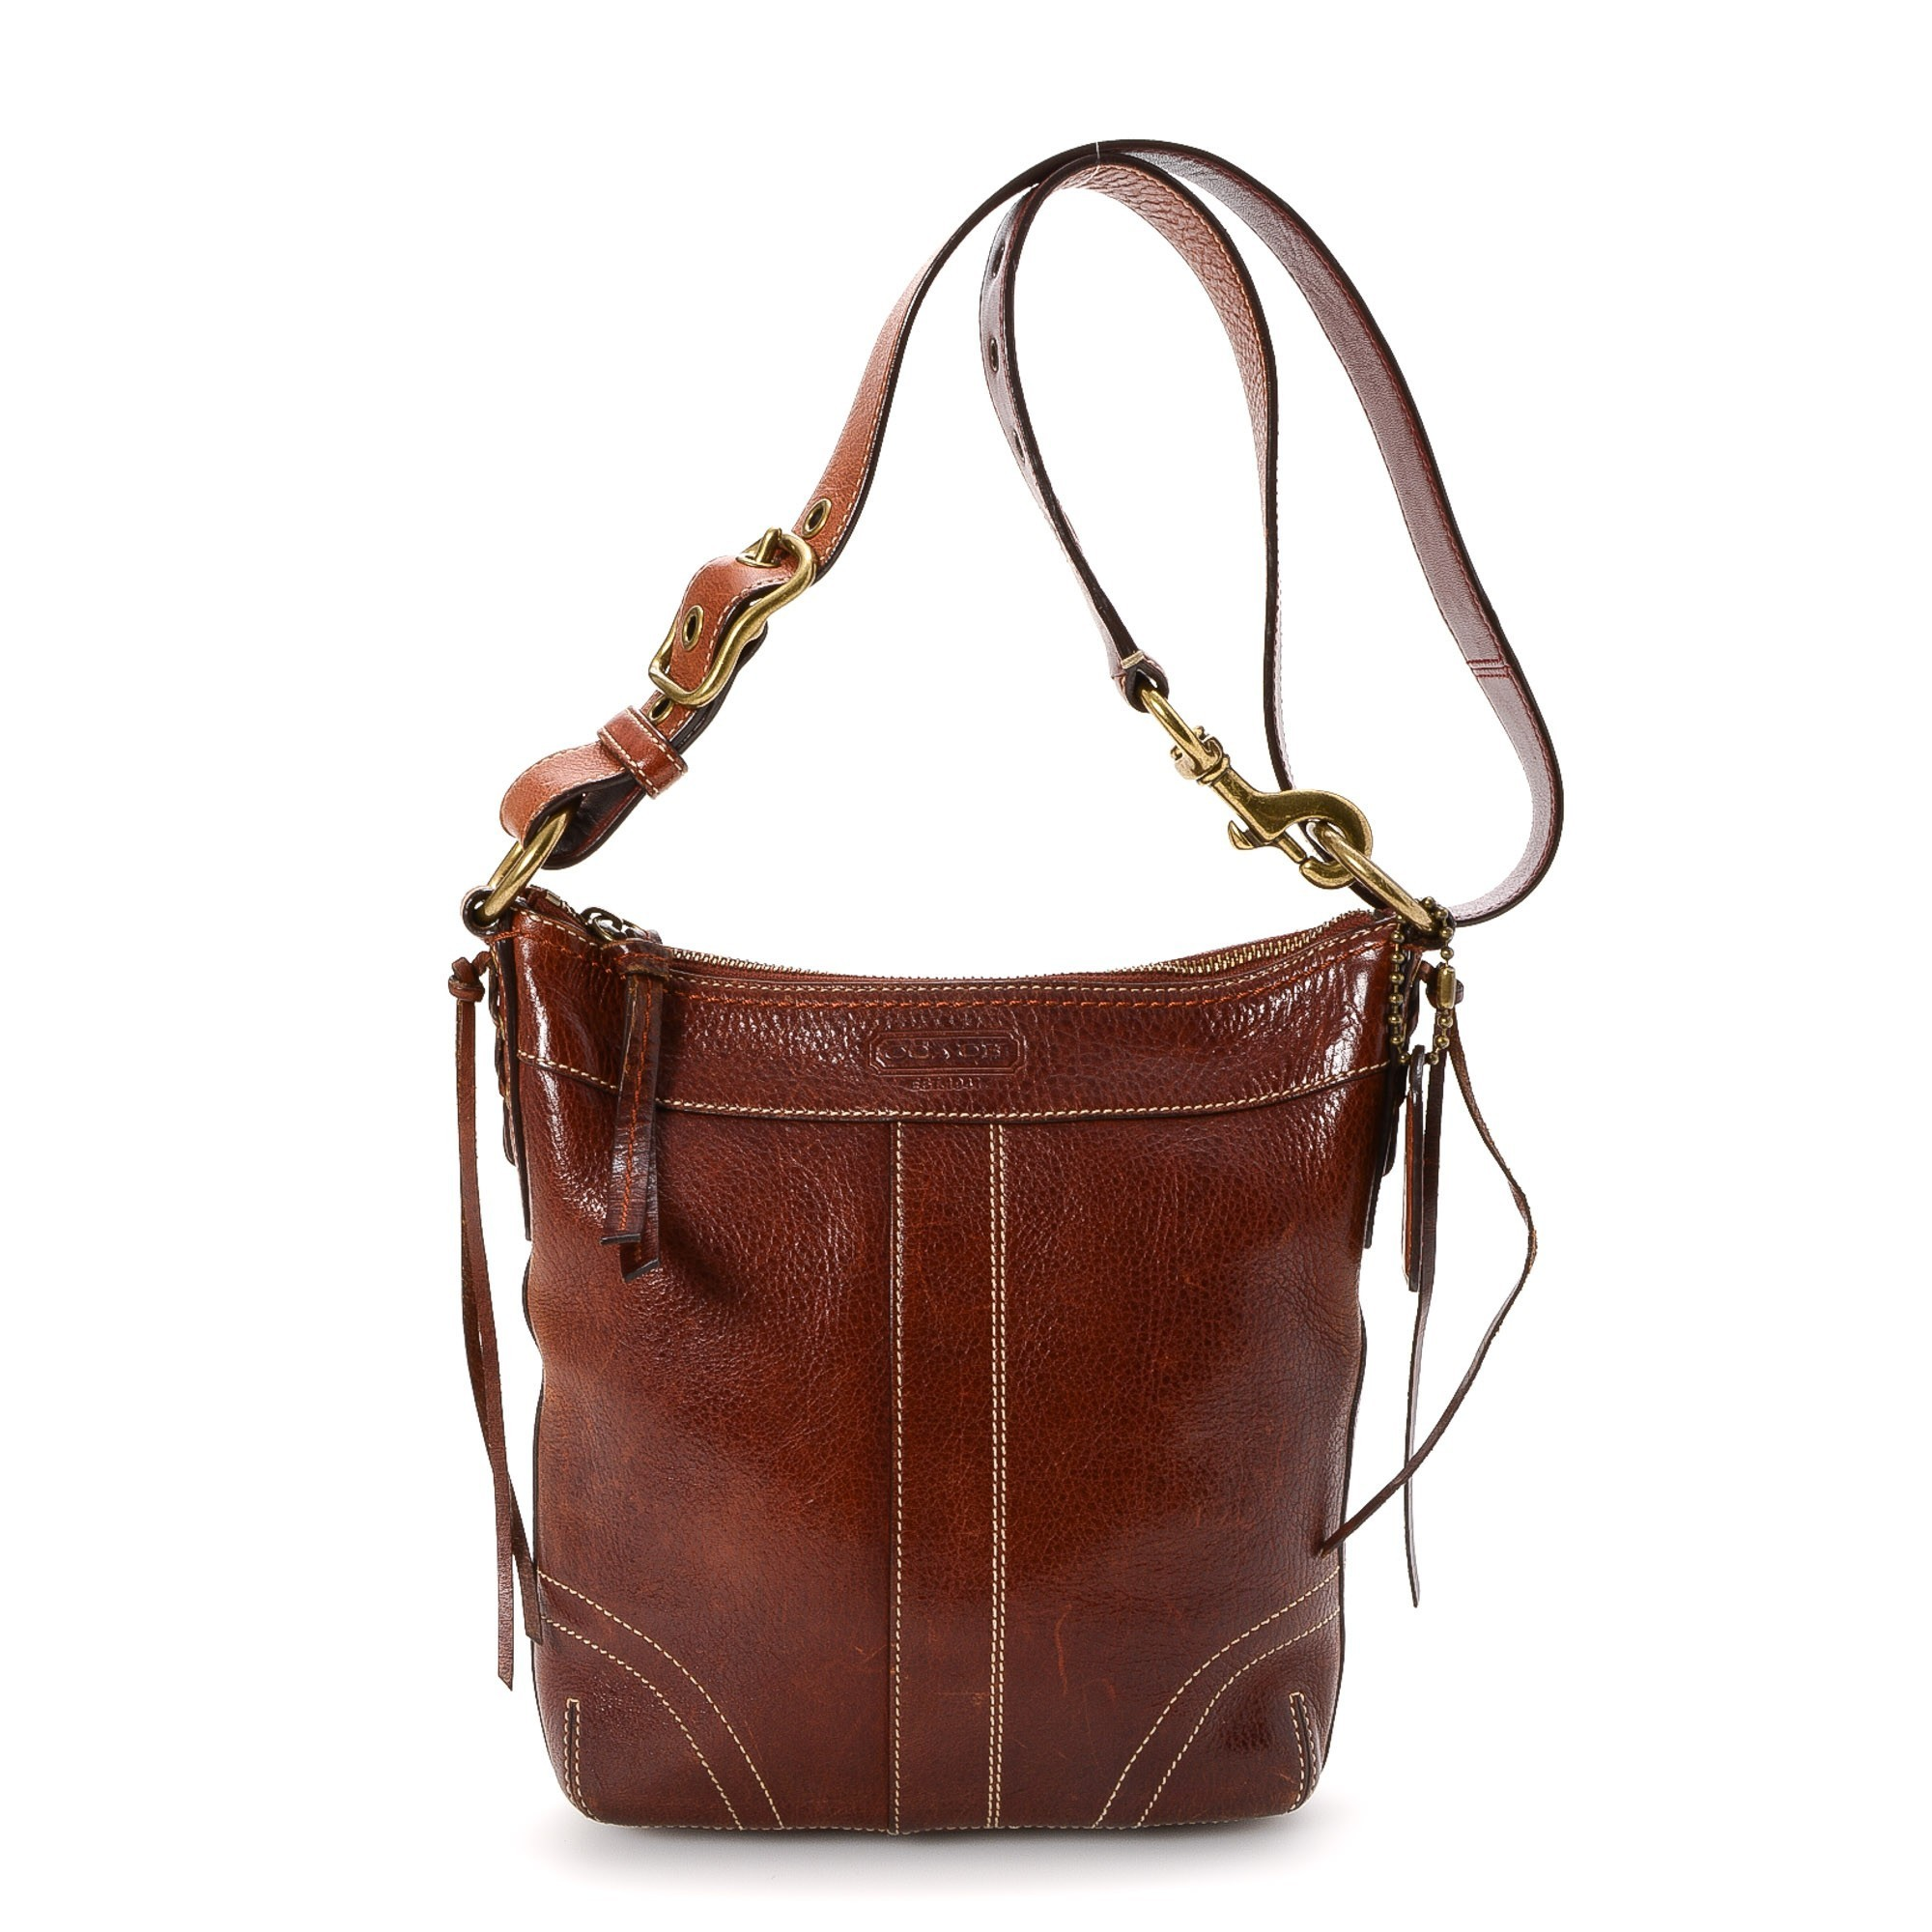 buy cognac leather coach messenger crossbody bag at lxr co. Black Bedroom Furniture Sets. Home Design Ideas